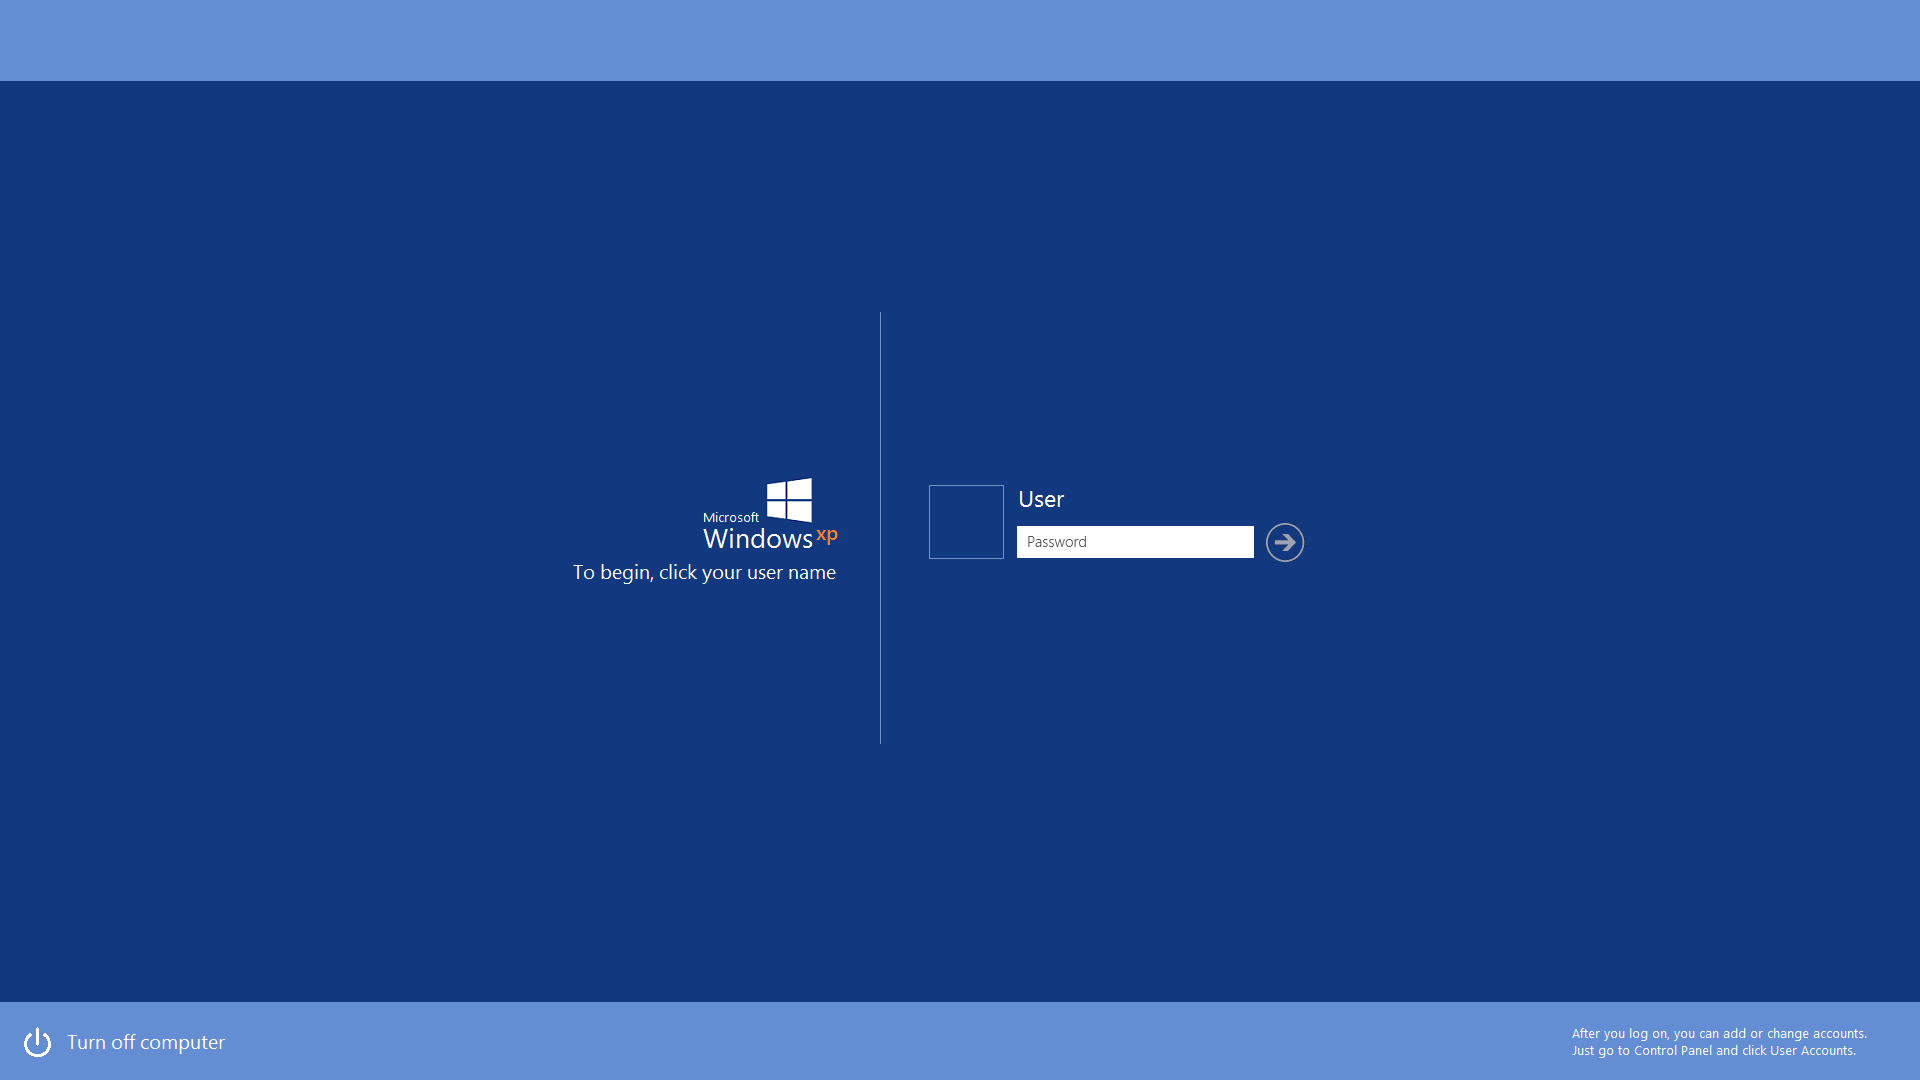 To Change Windows Xp Welcome Screen Lock Screen Wallpaper Screen Wallpaper Screen